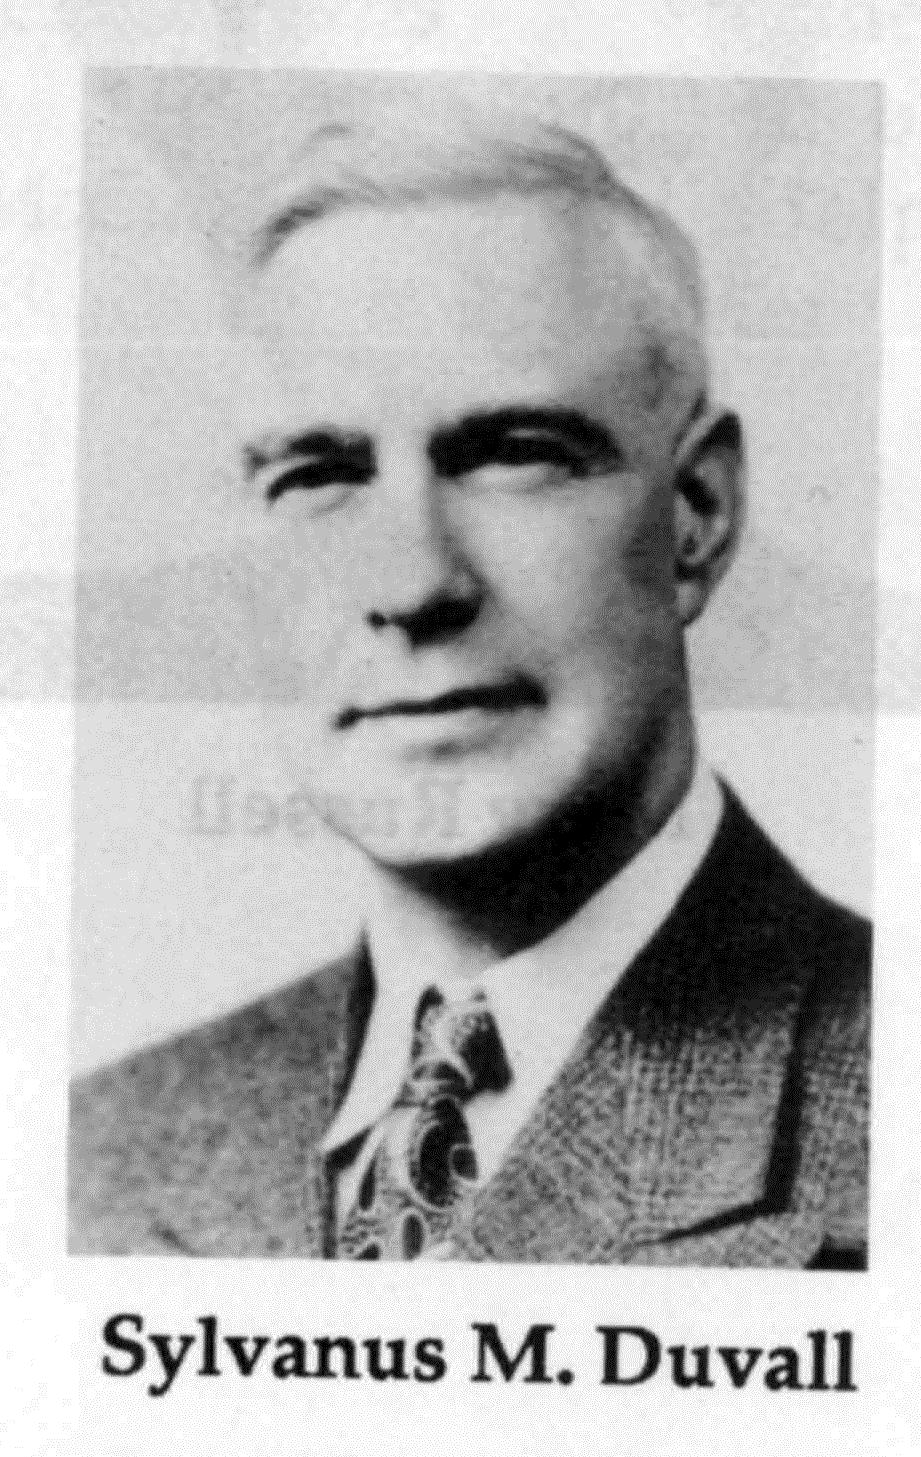 Sylvanus Duvall